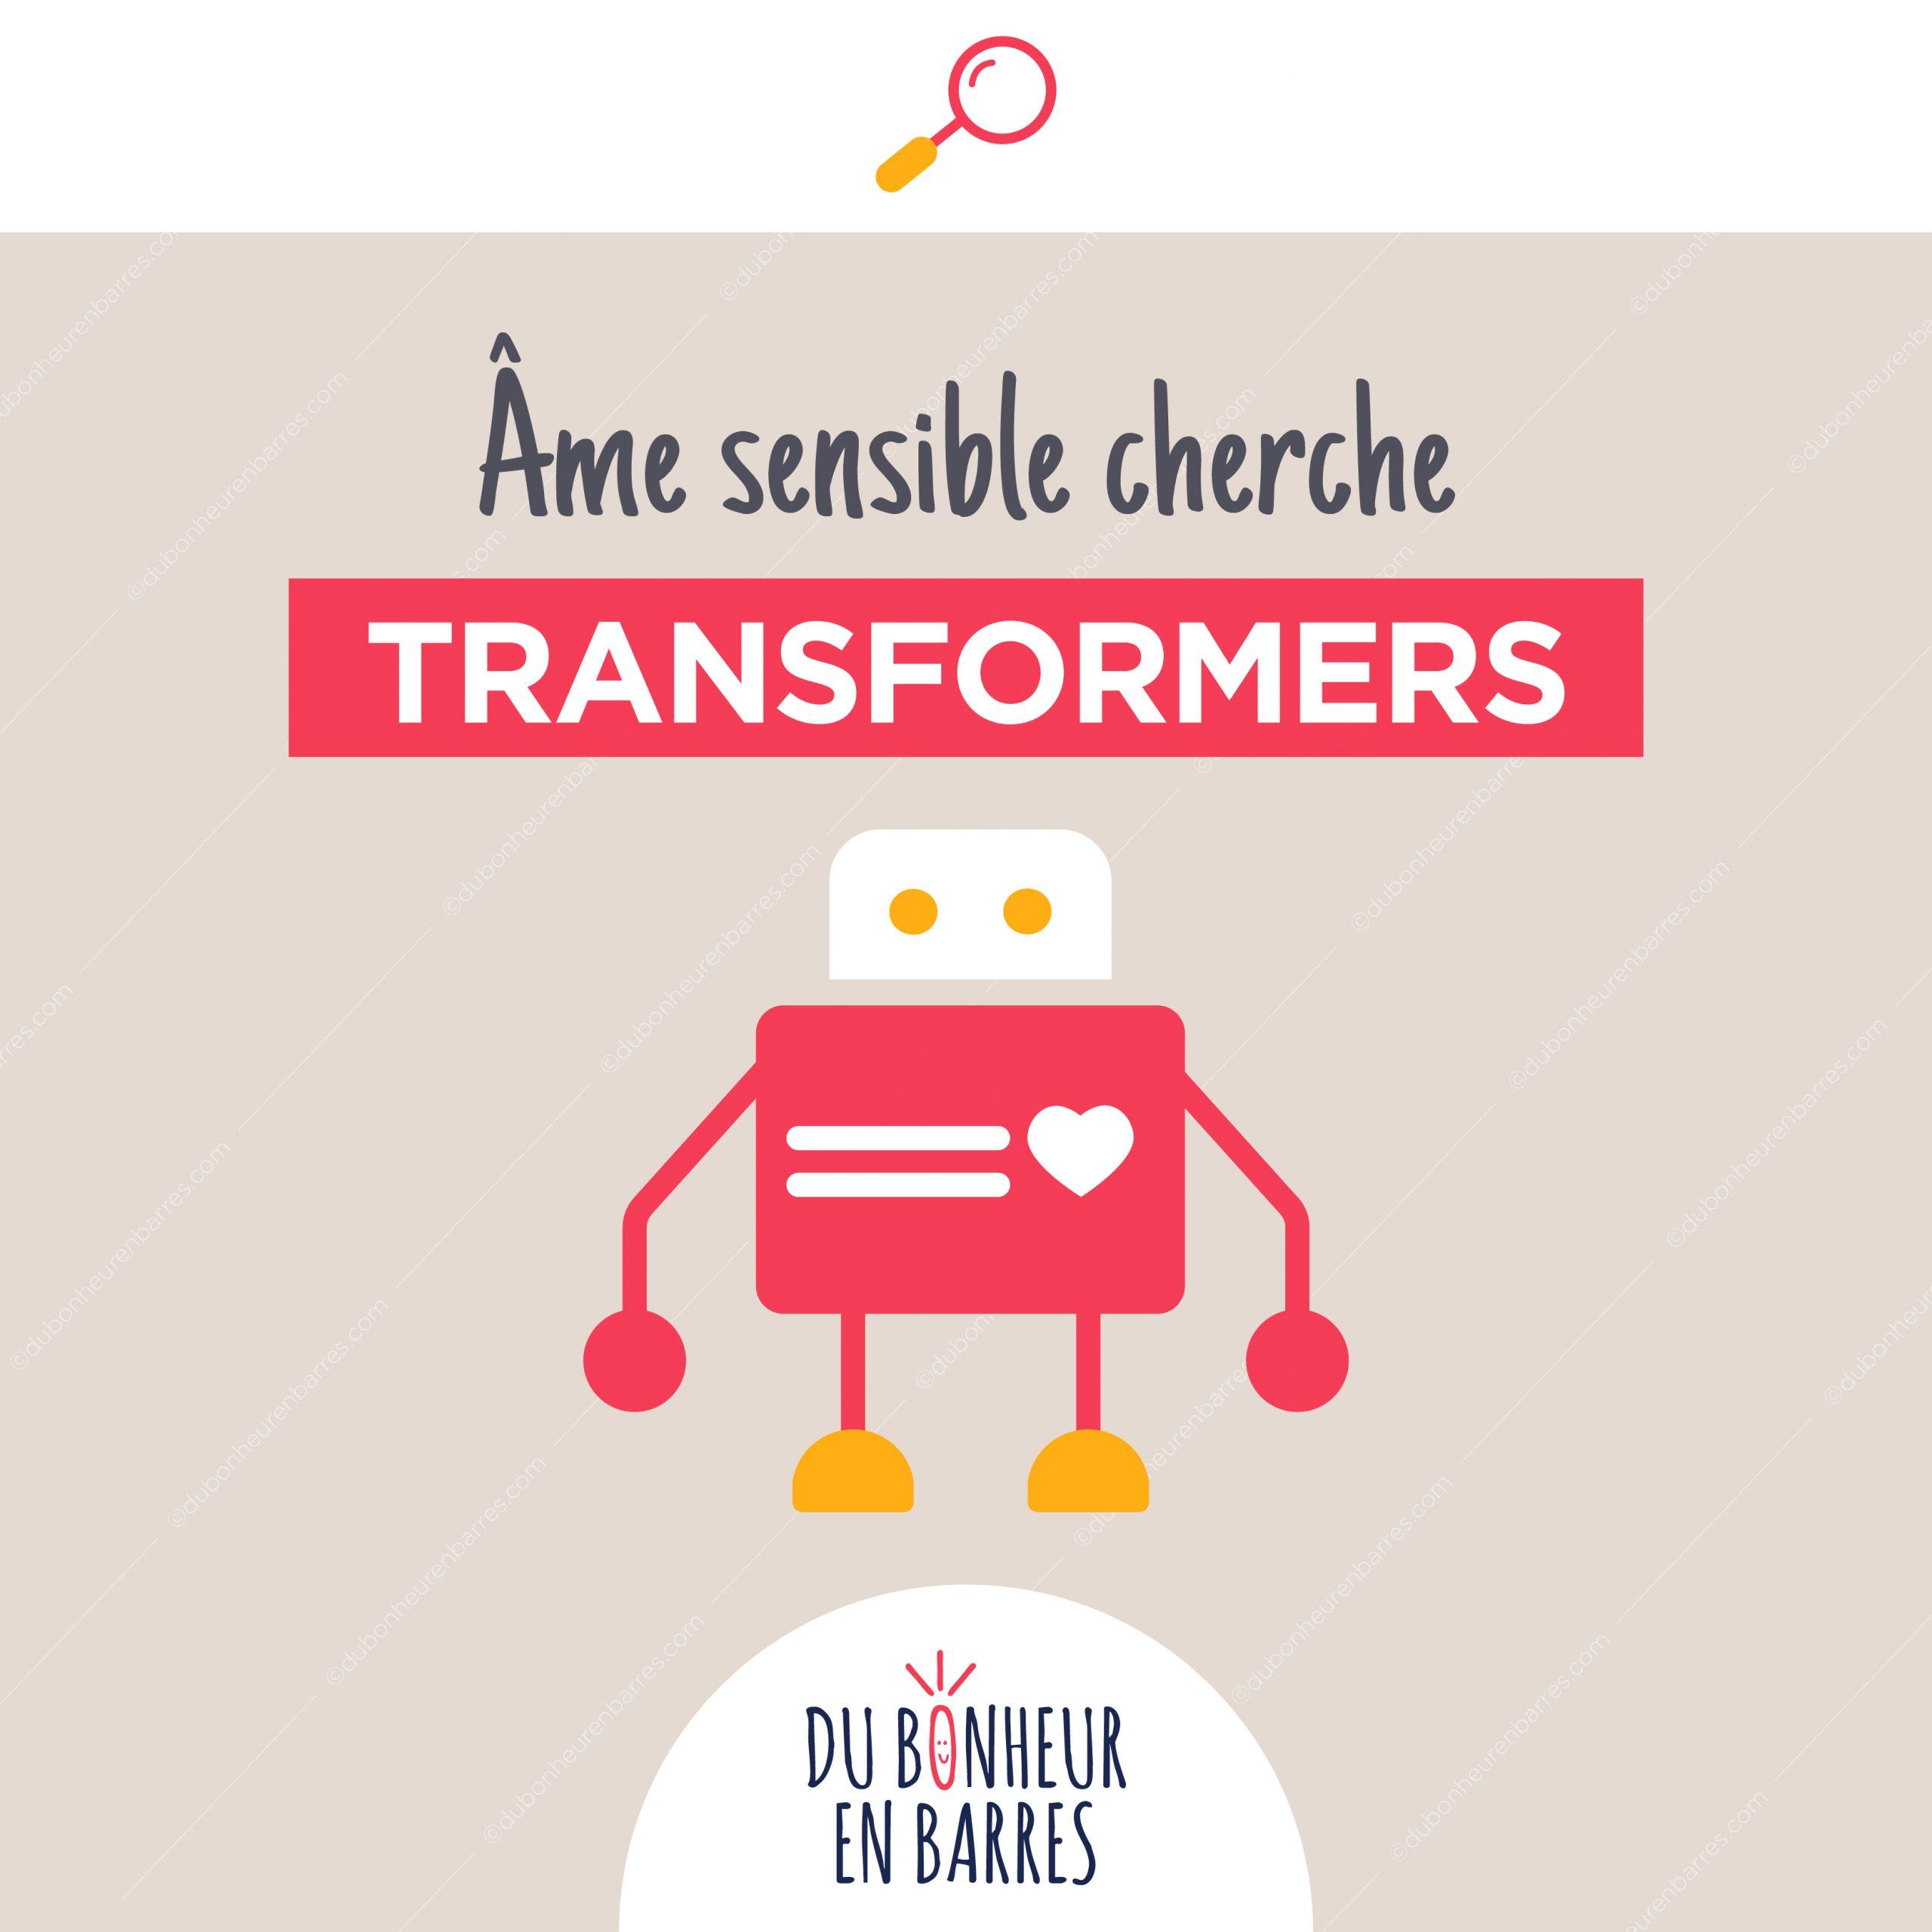 Hypersensible cherche transformers